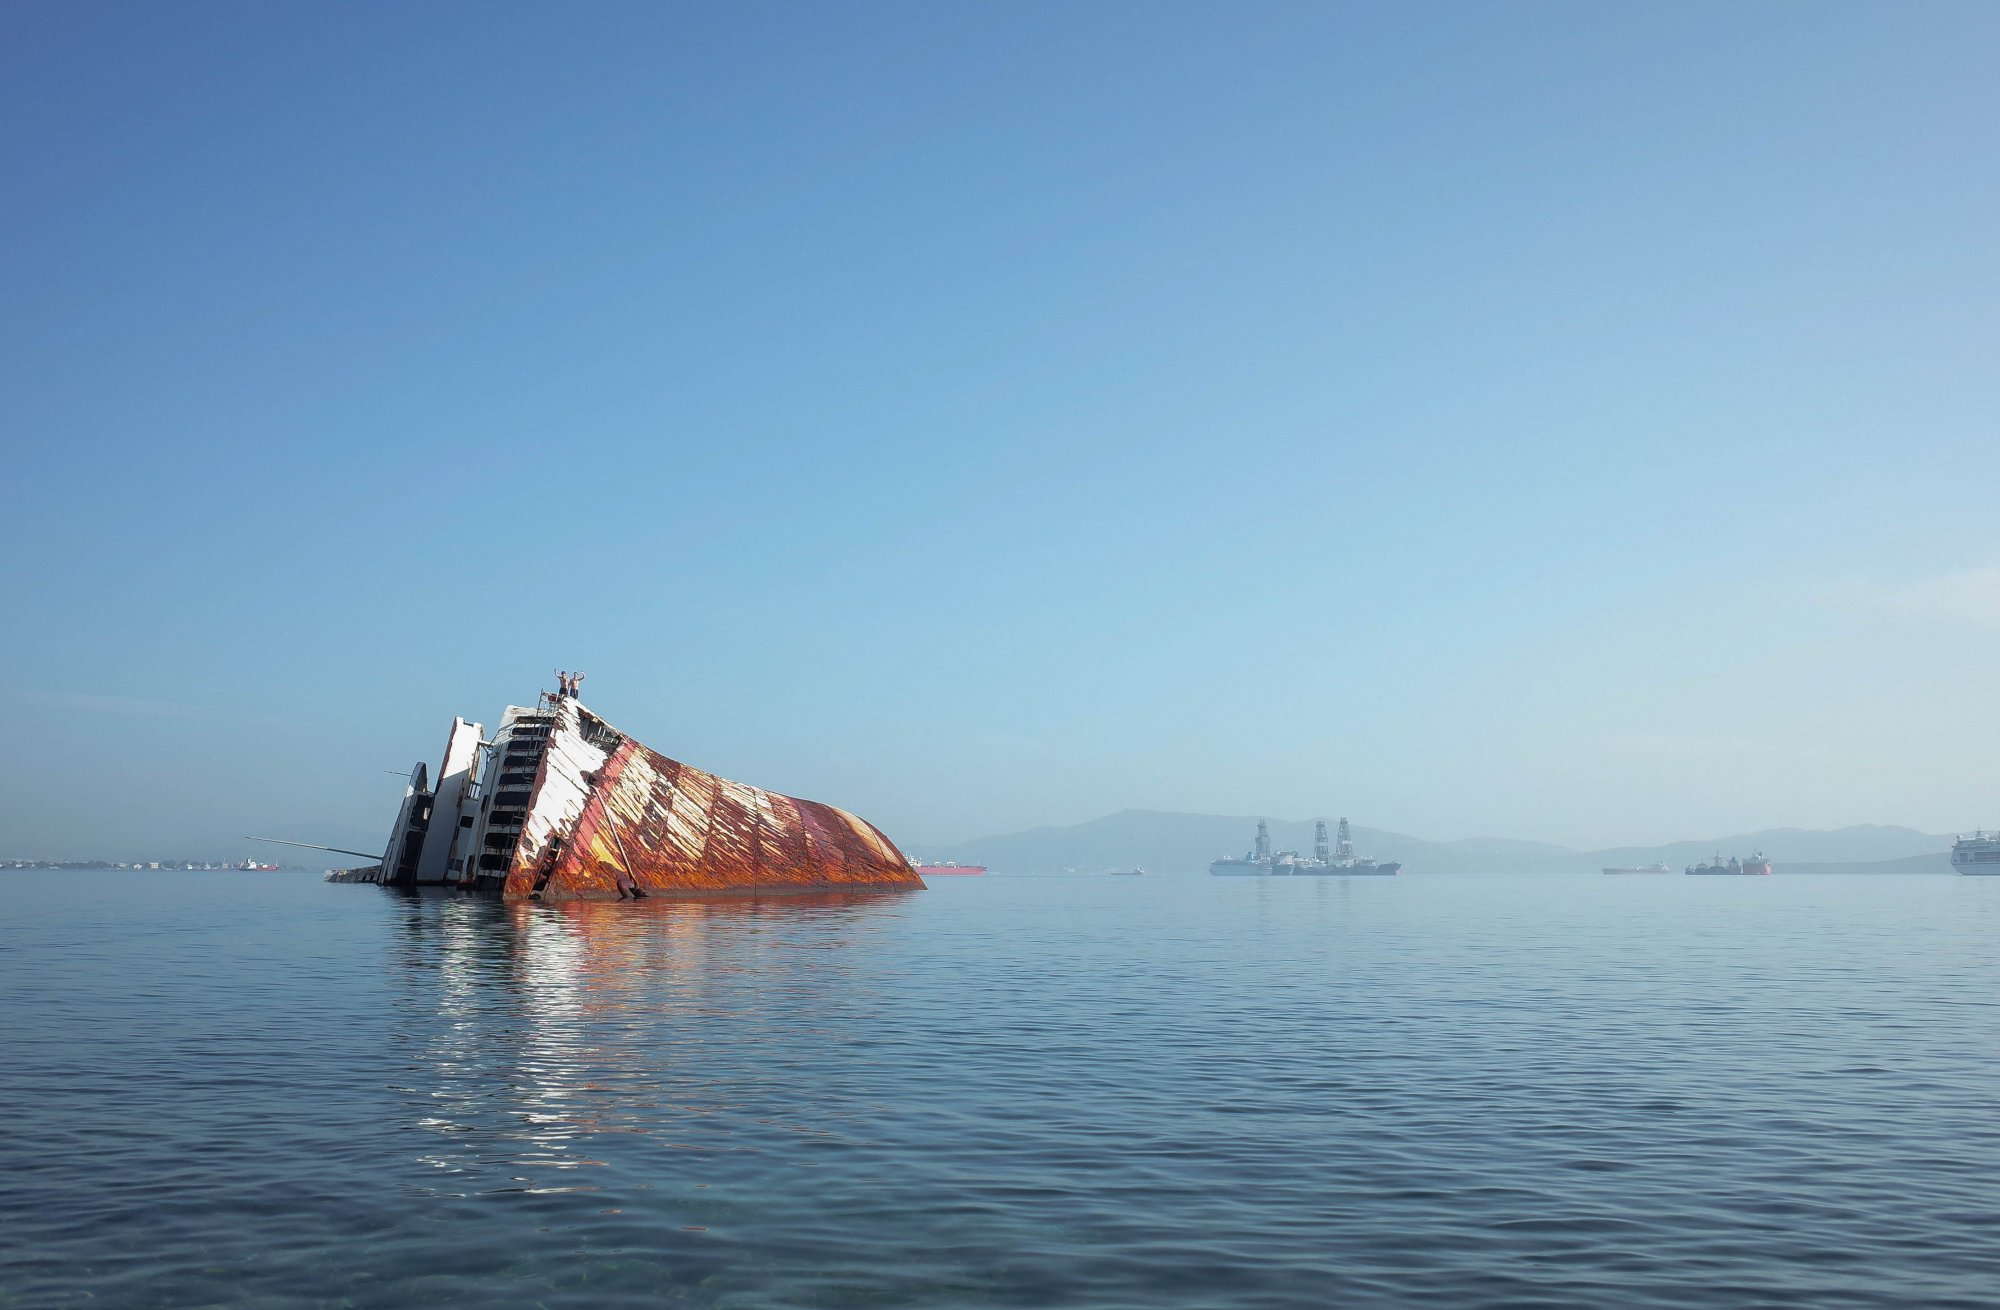 Vrak lodi